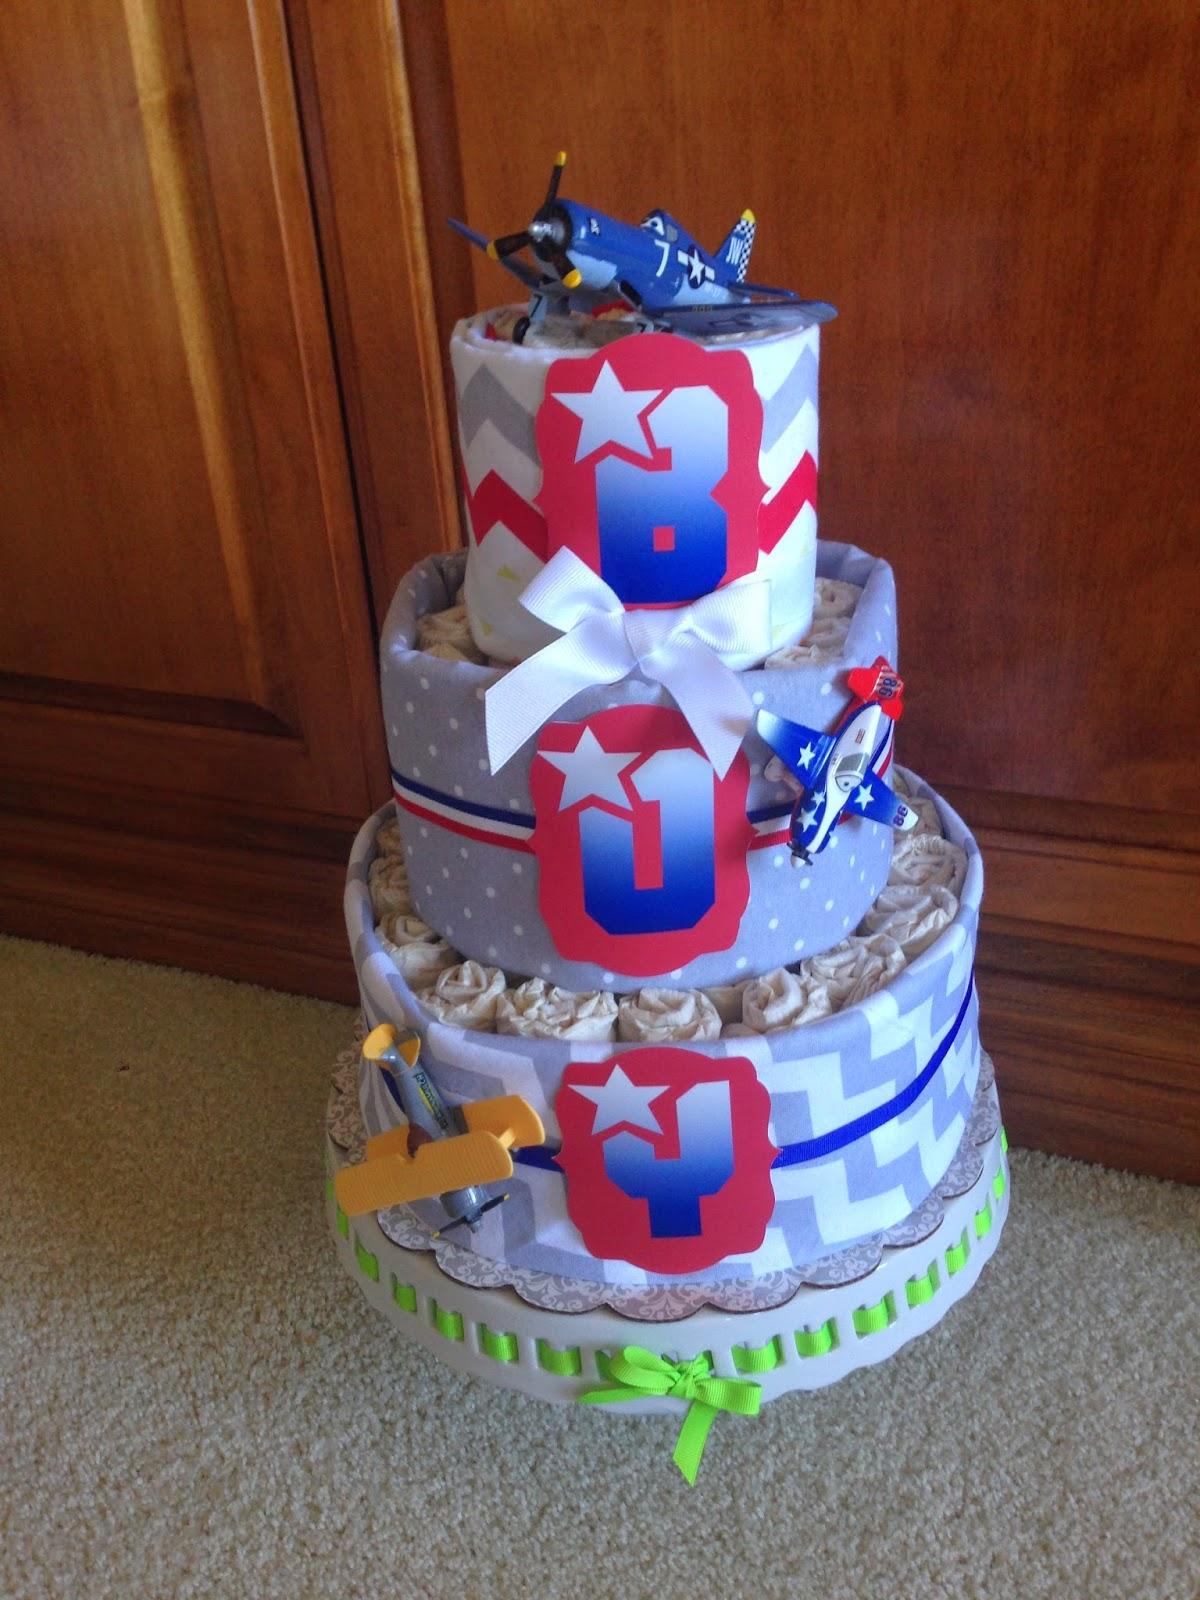 Top Kaylynn Cakes: Diaper Cakes PB63